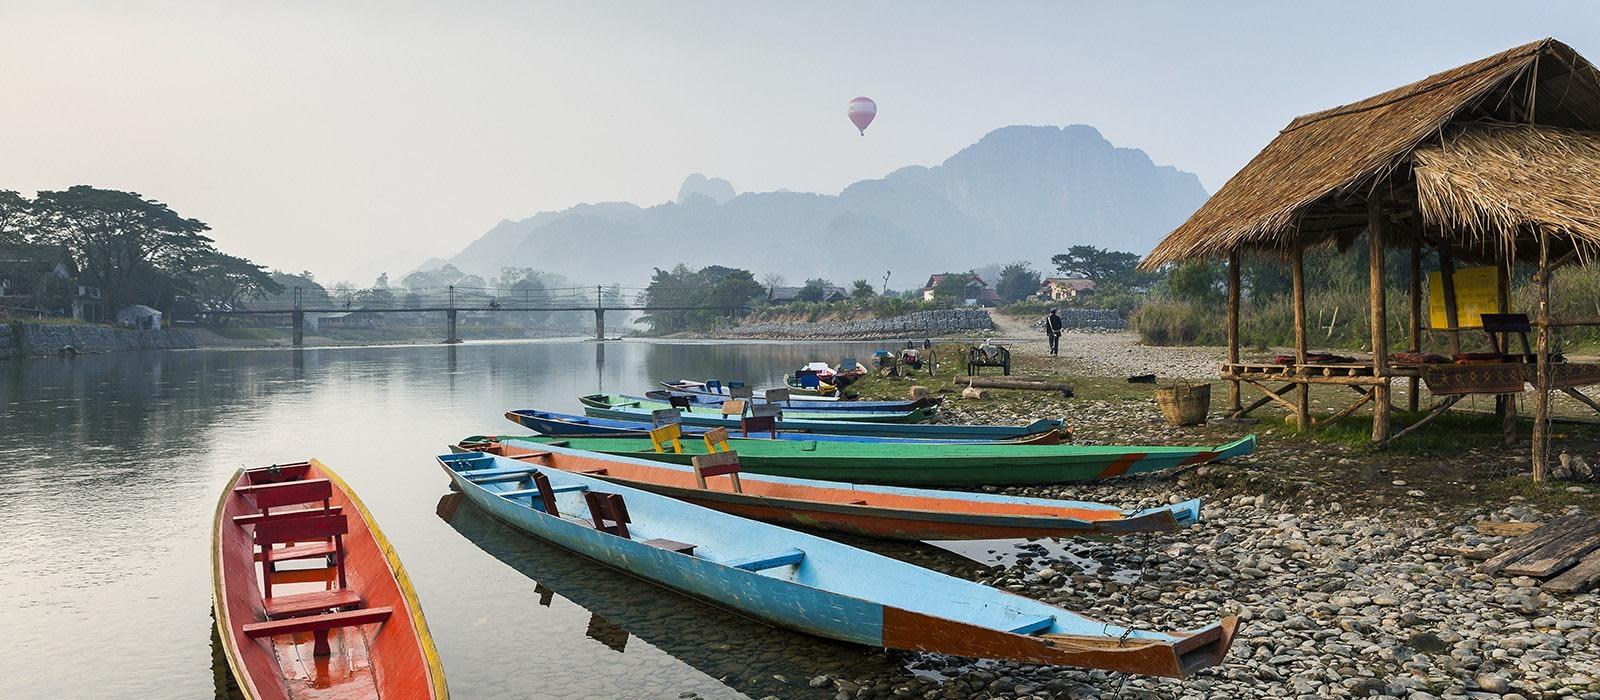 Reiseziel Huay Xai / Mekong Thailand